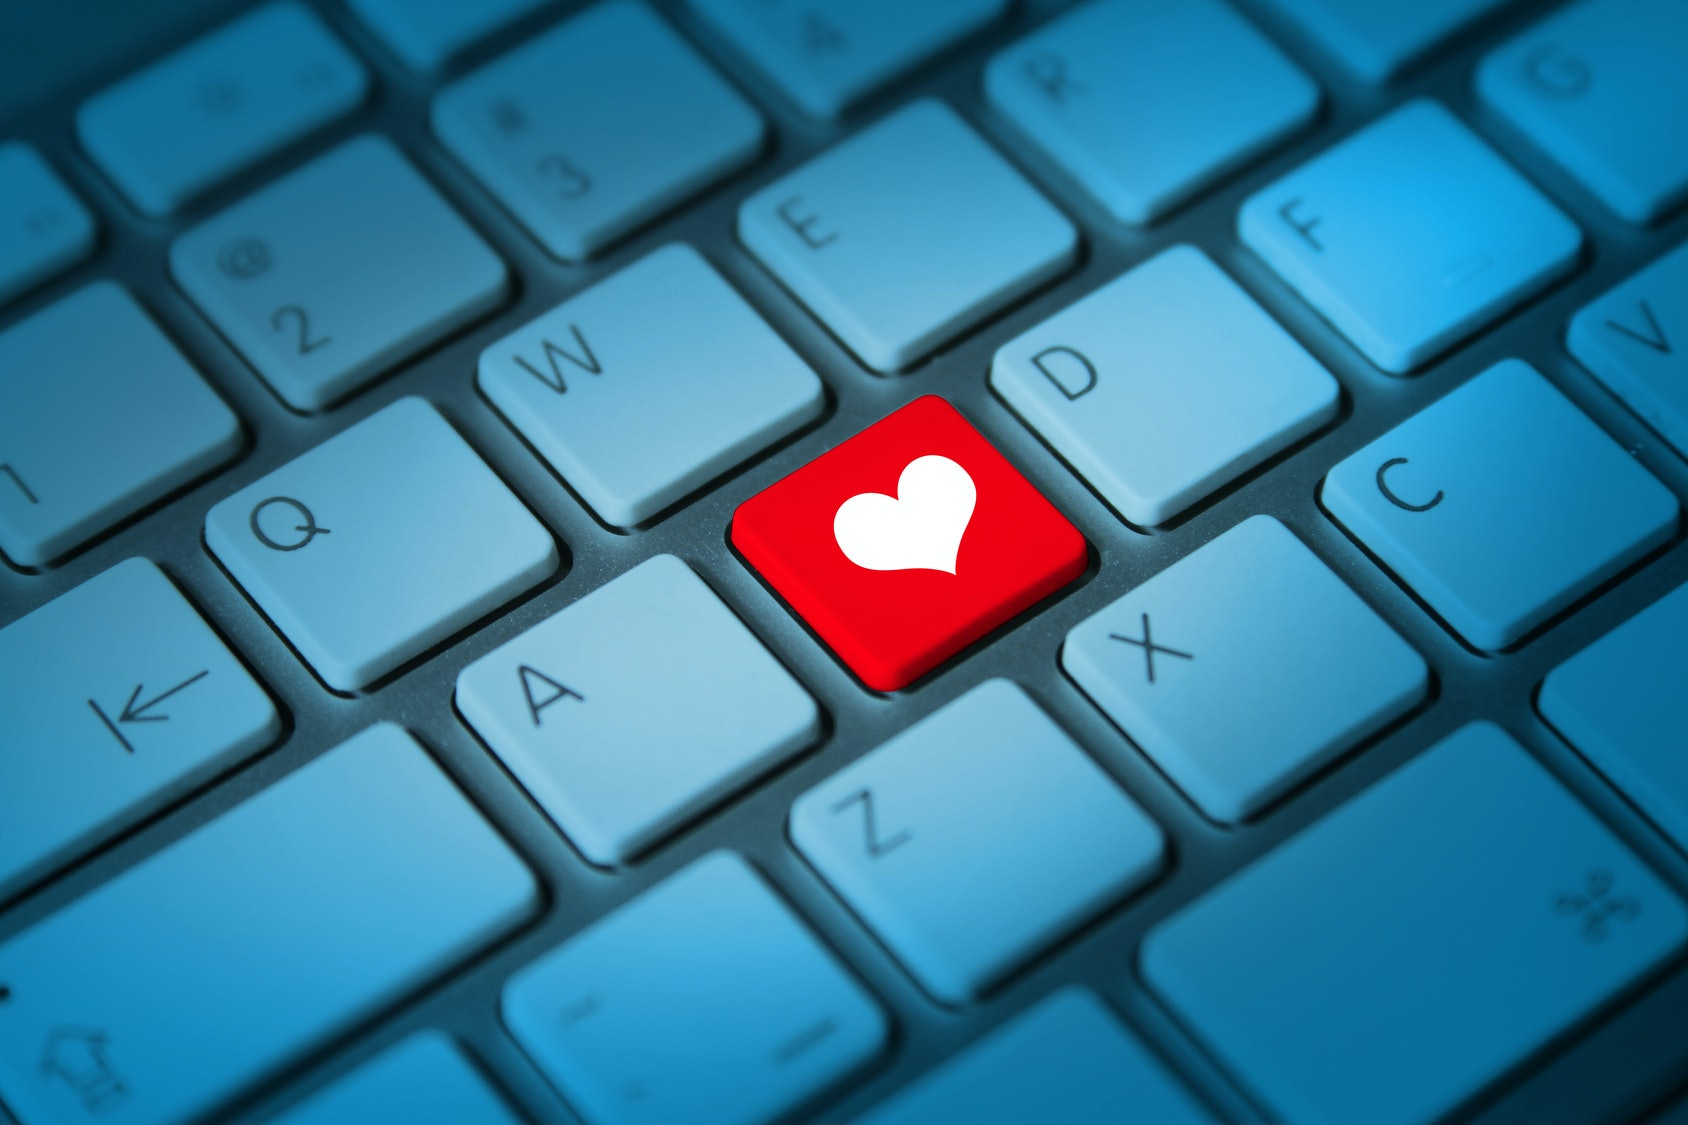 Aaroncarterfan online dating profile